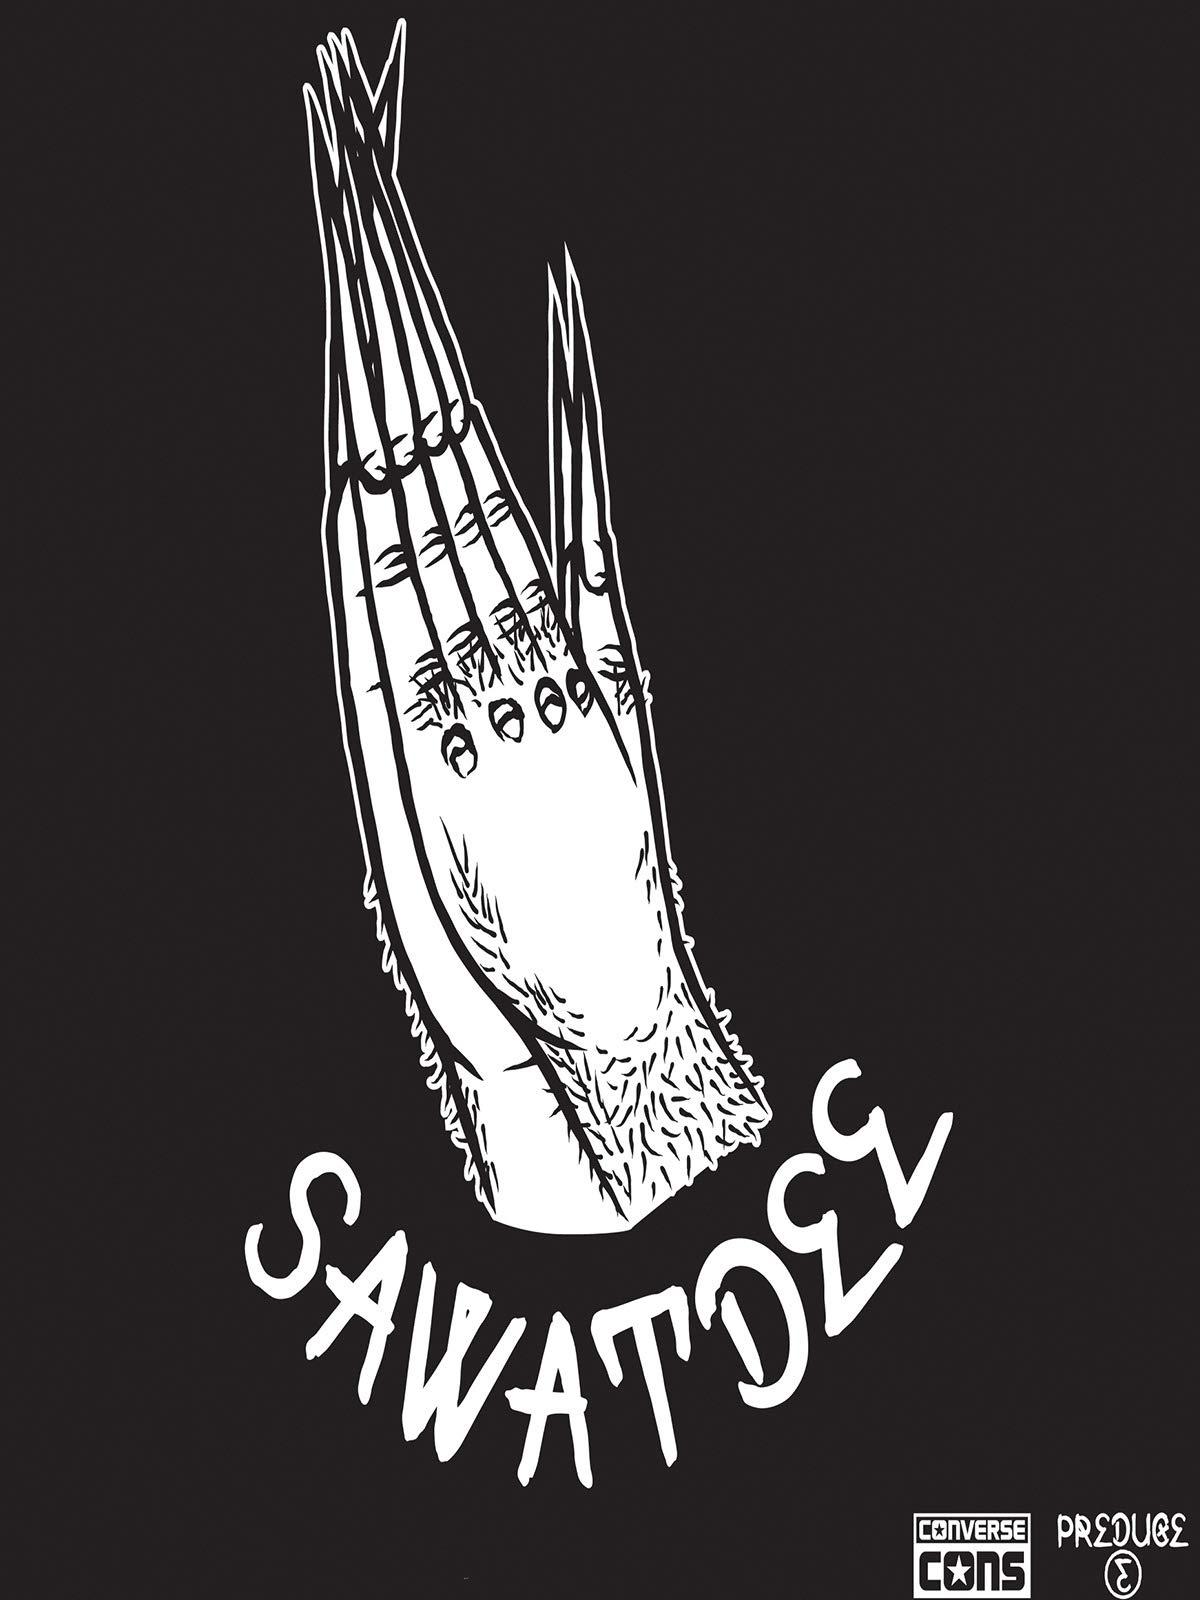 Sawatdee